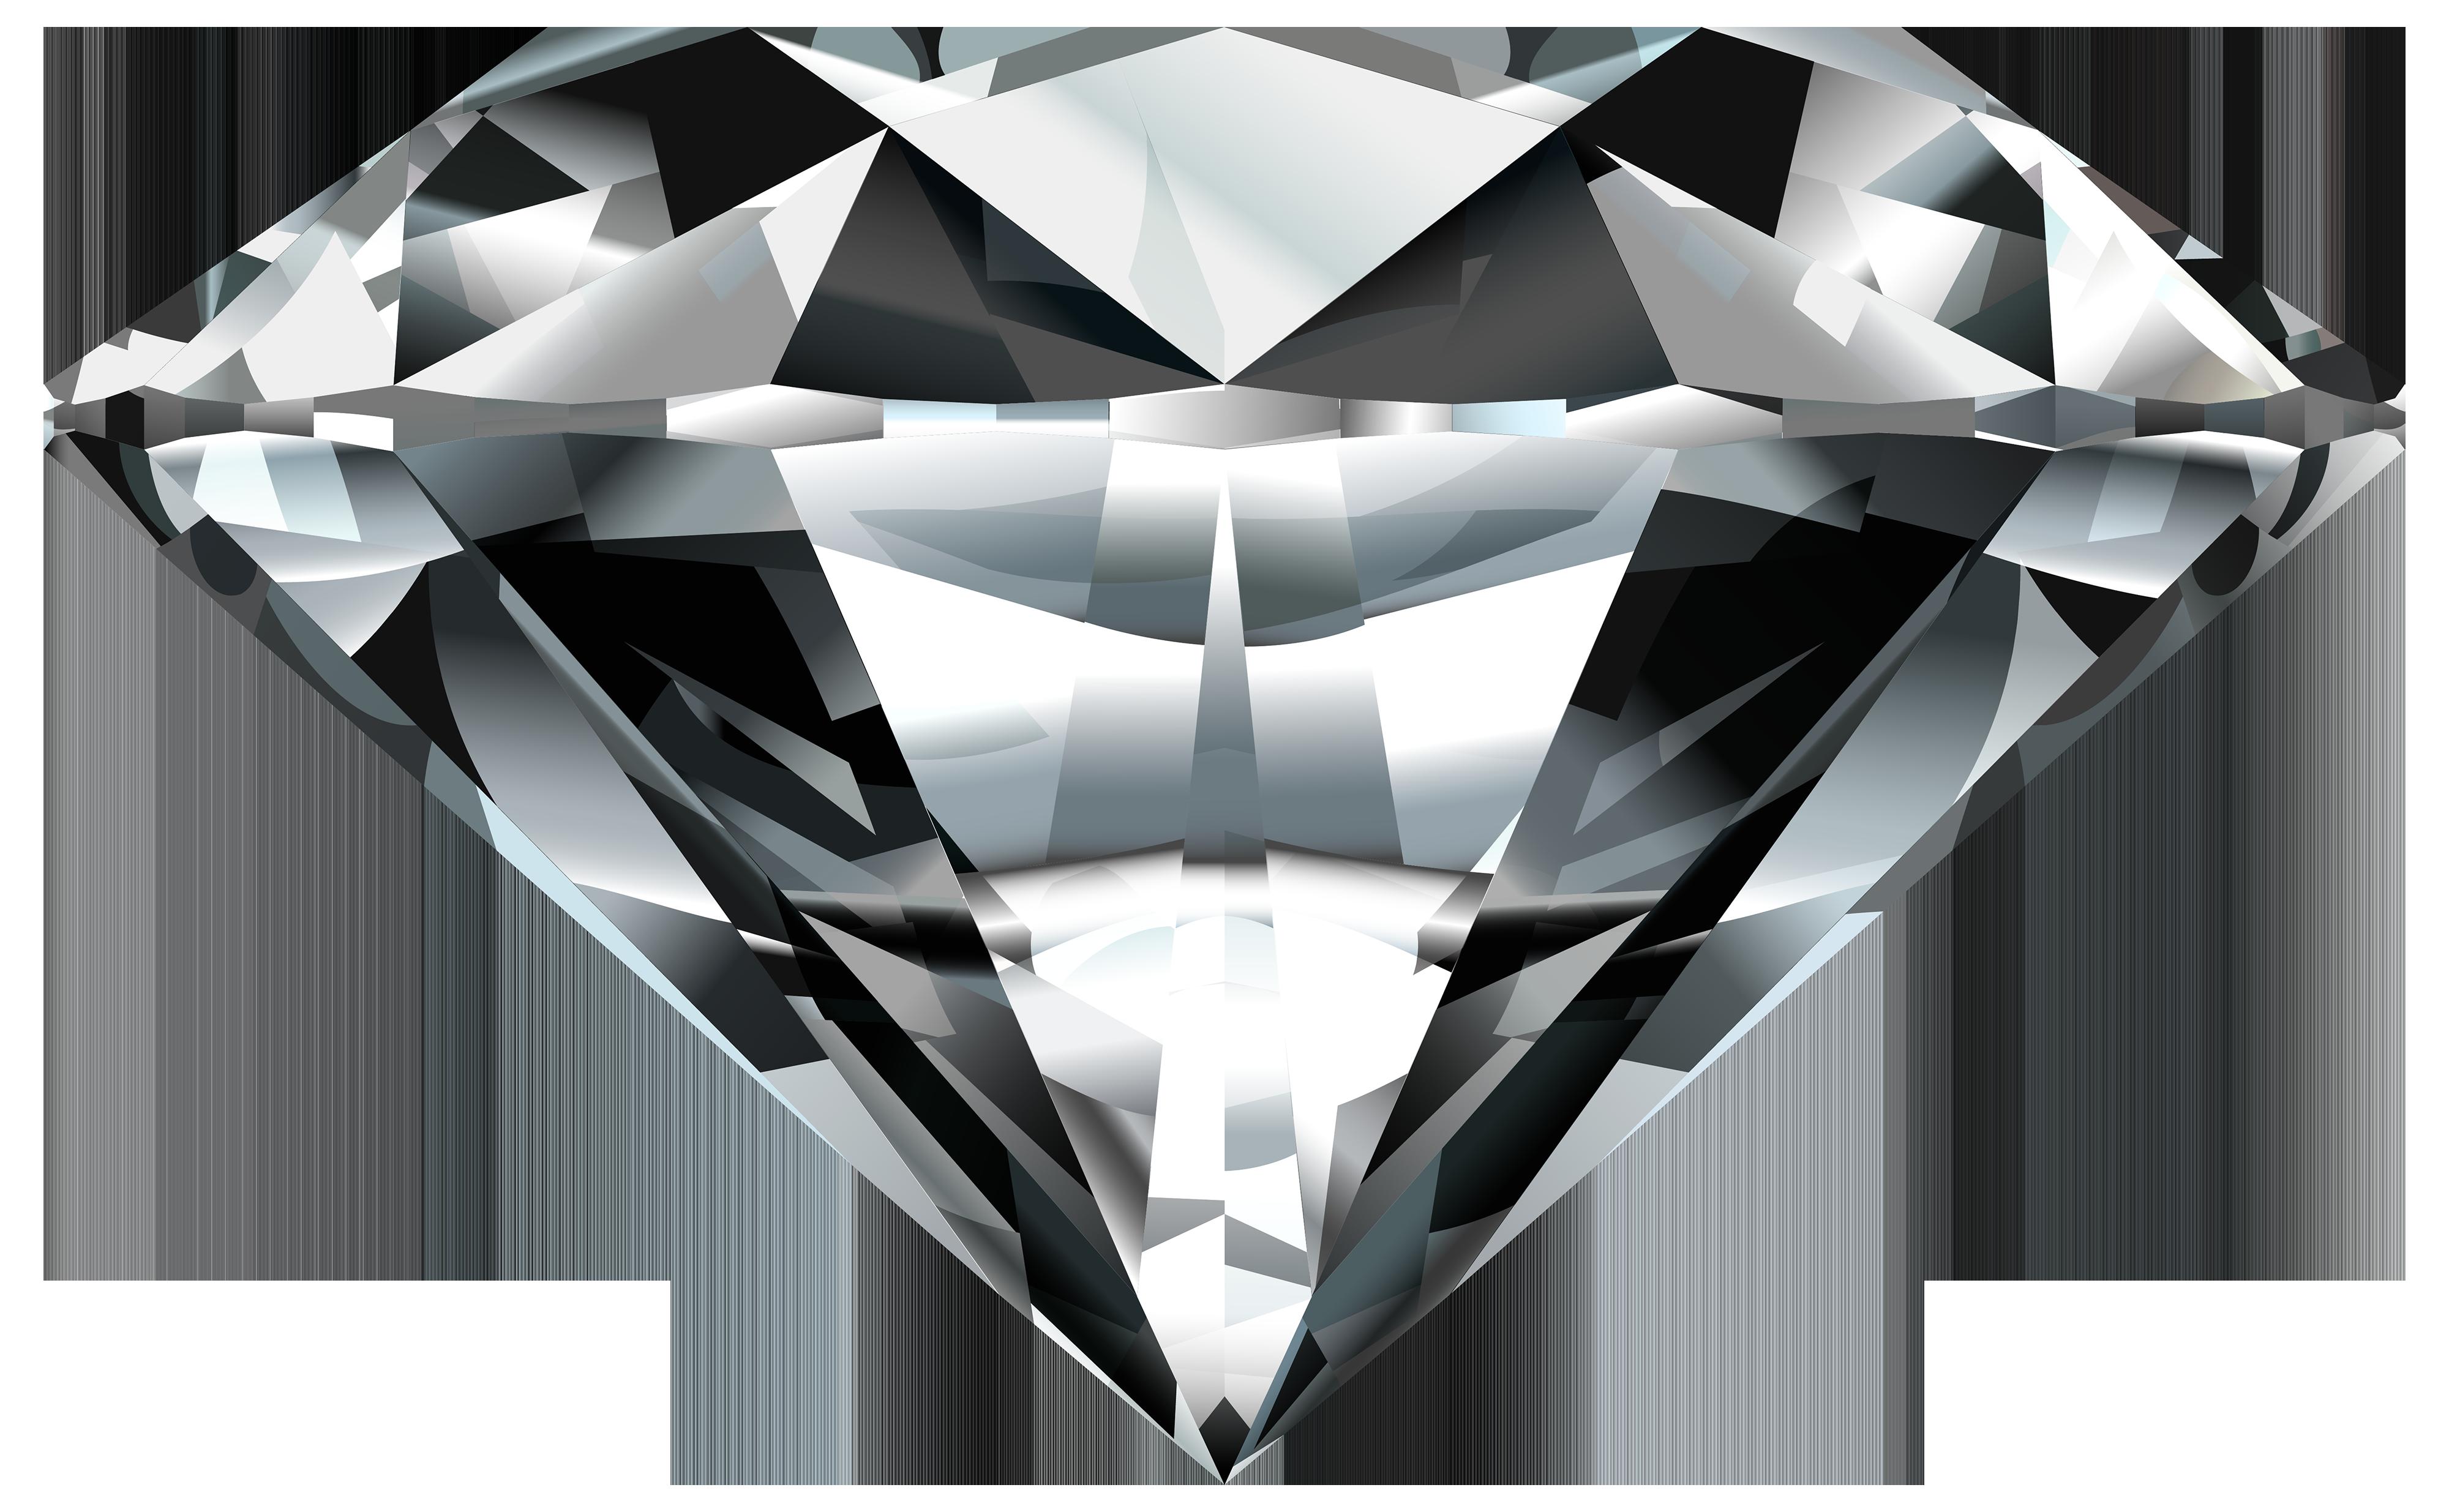 Jewel clipart daimond. The diamond symbol of